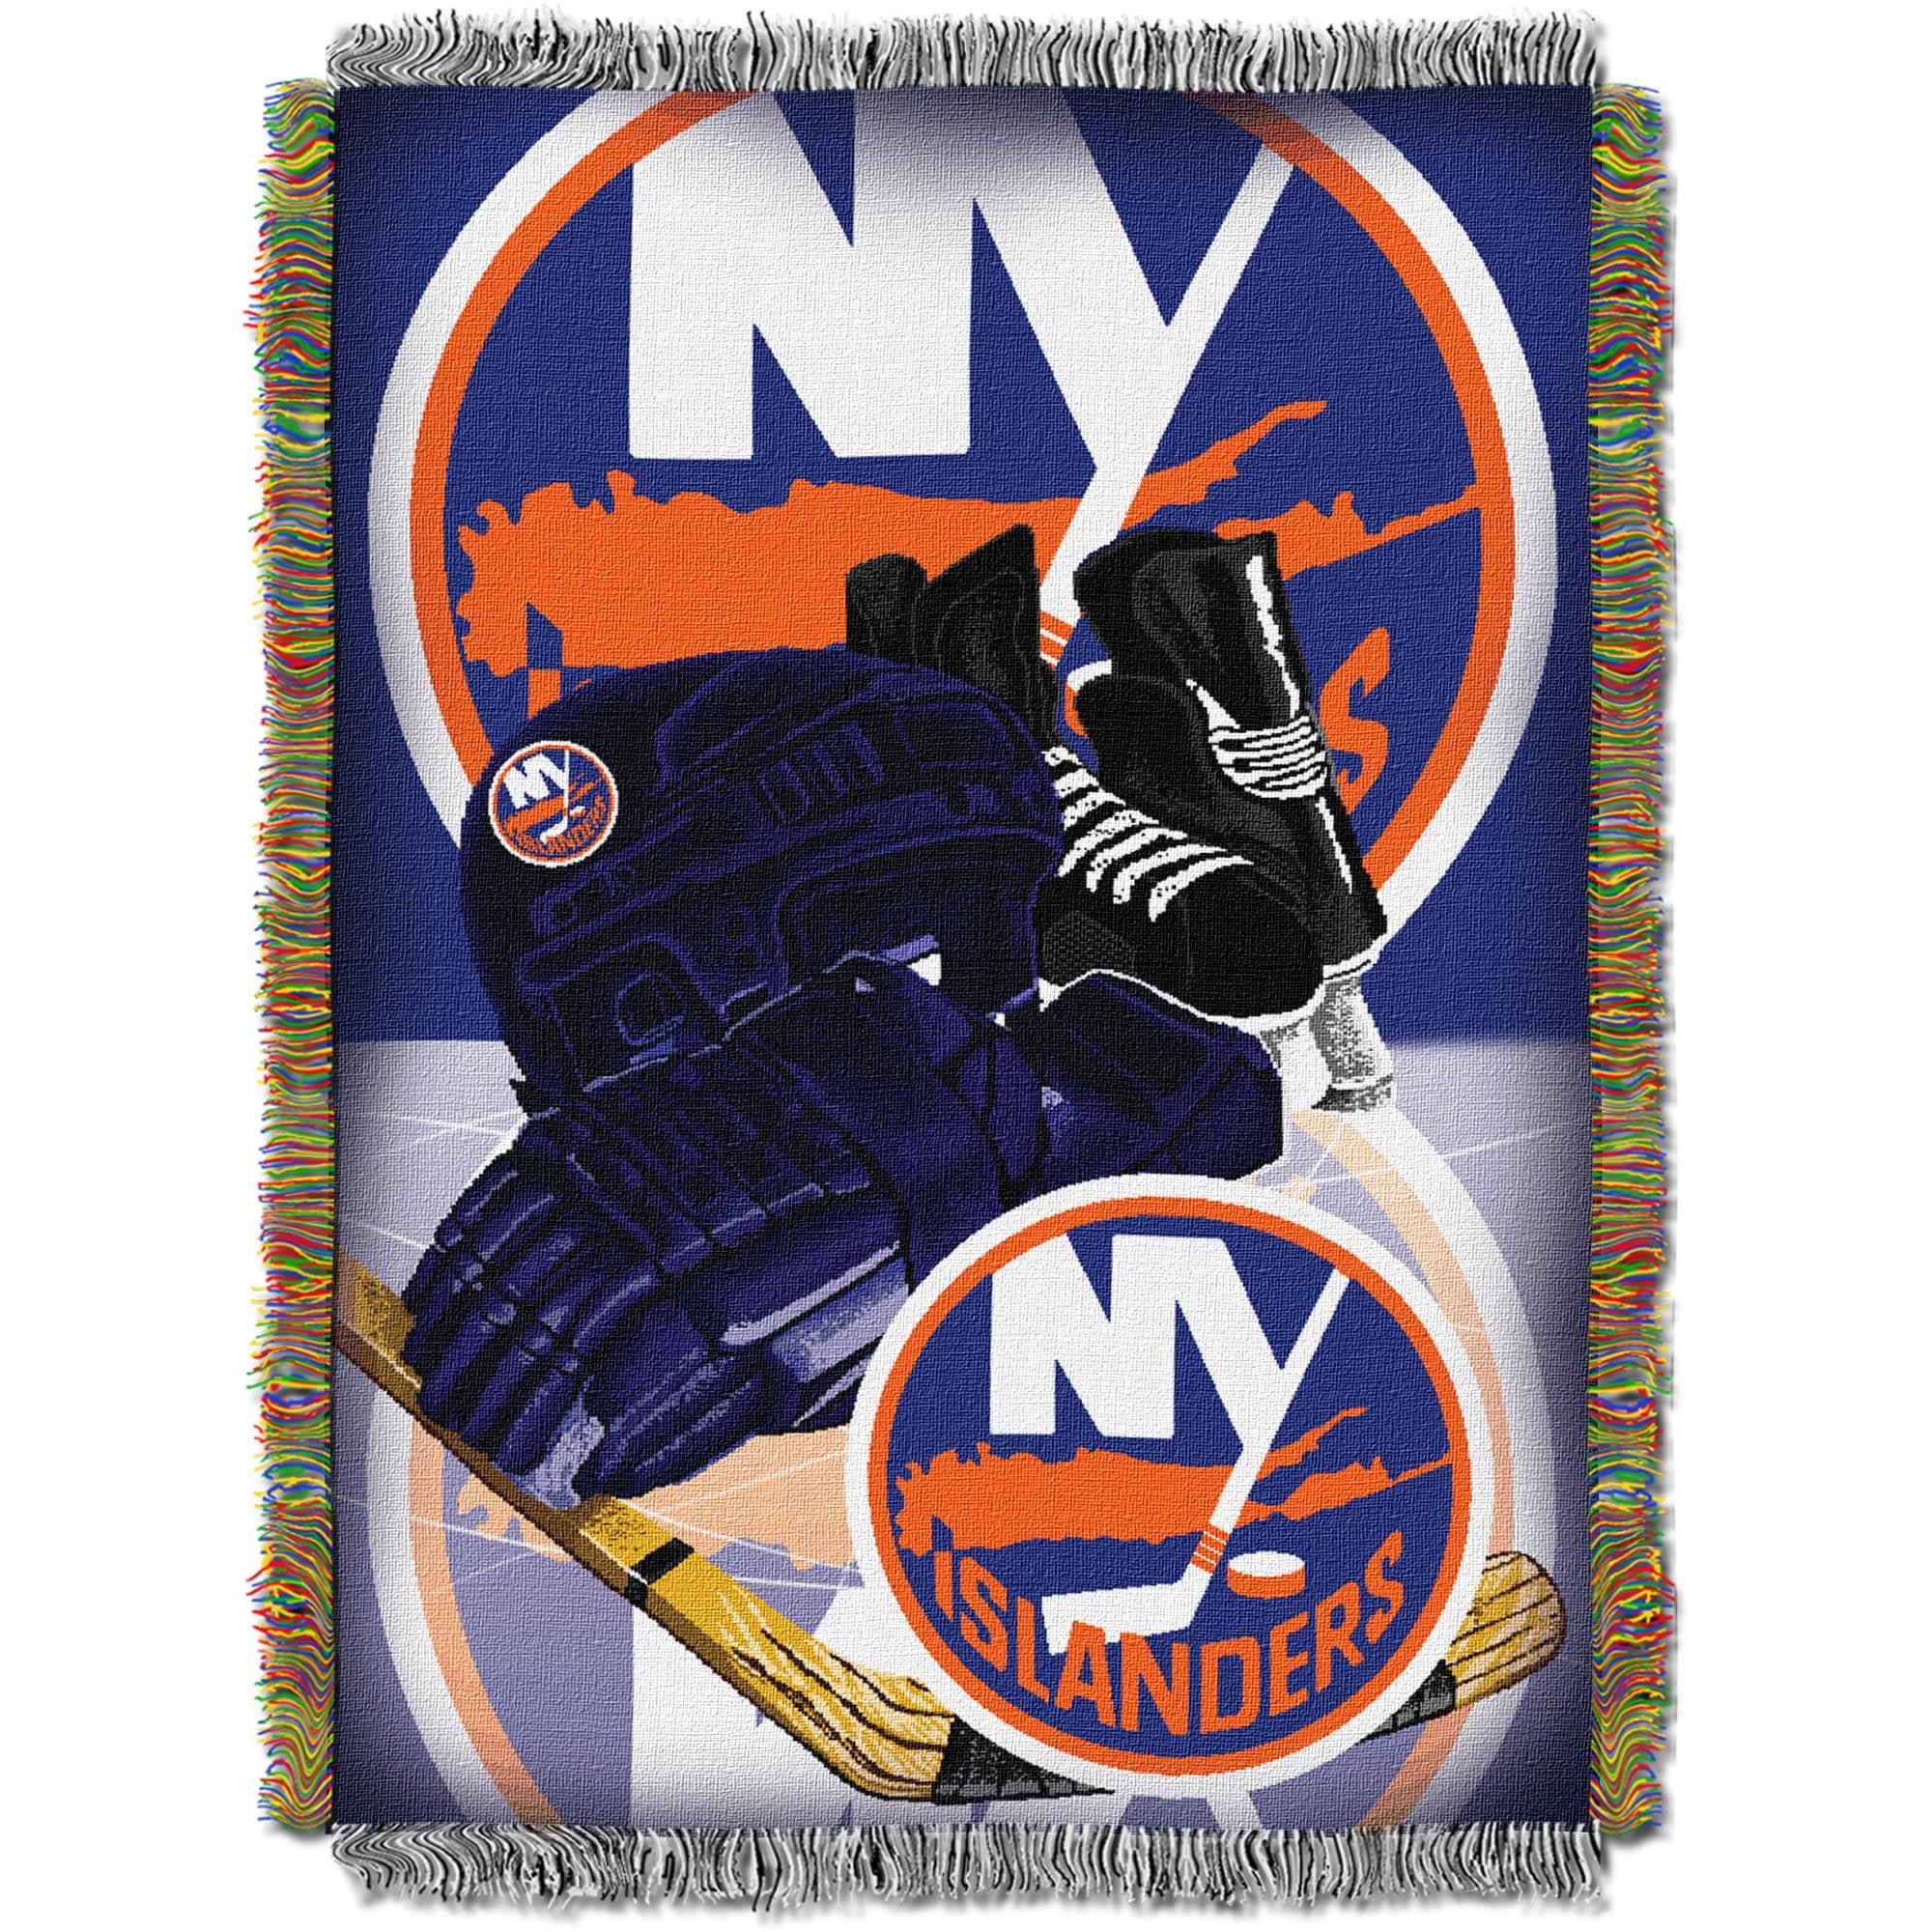 "NHL 48"" x 60"" Home Ice Advantage Series Tapestry Throw, Islanders"